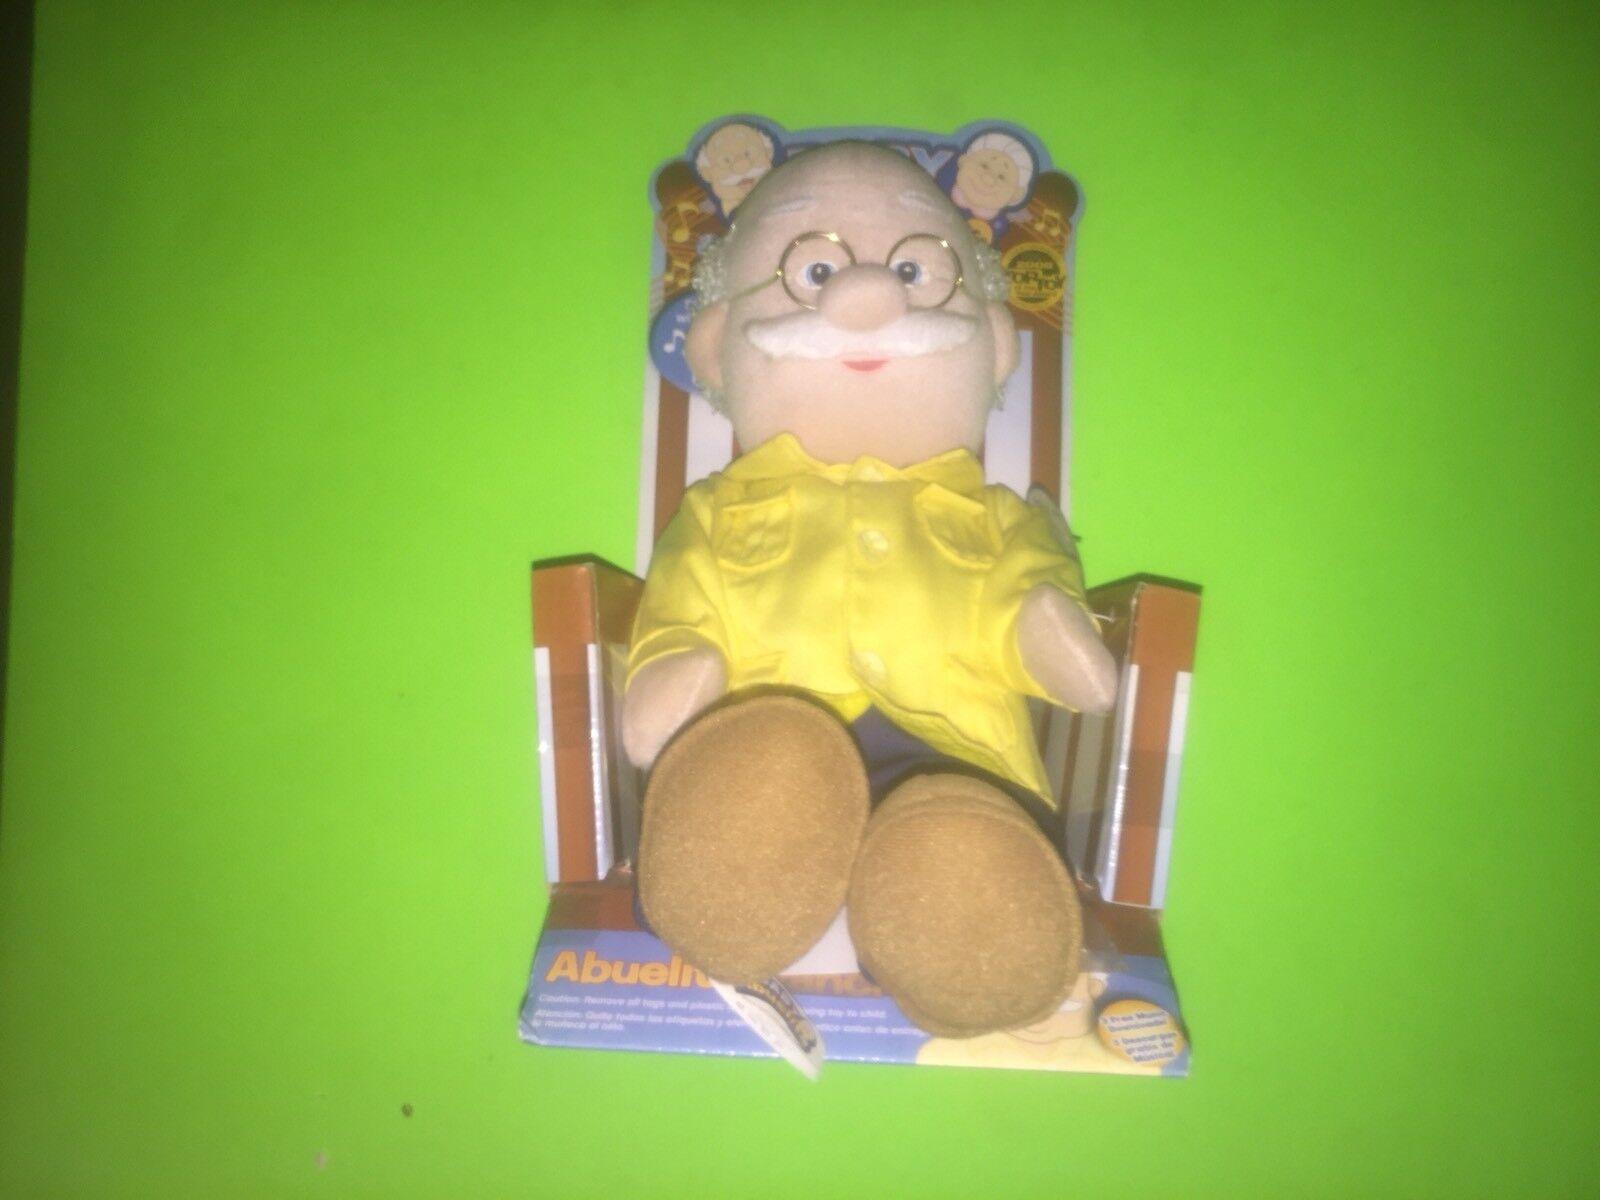 New NIB Abuelito Pancho Grandpa Baby Abuelita Musical Singing Spanish Plush Doll